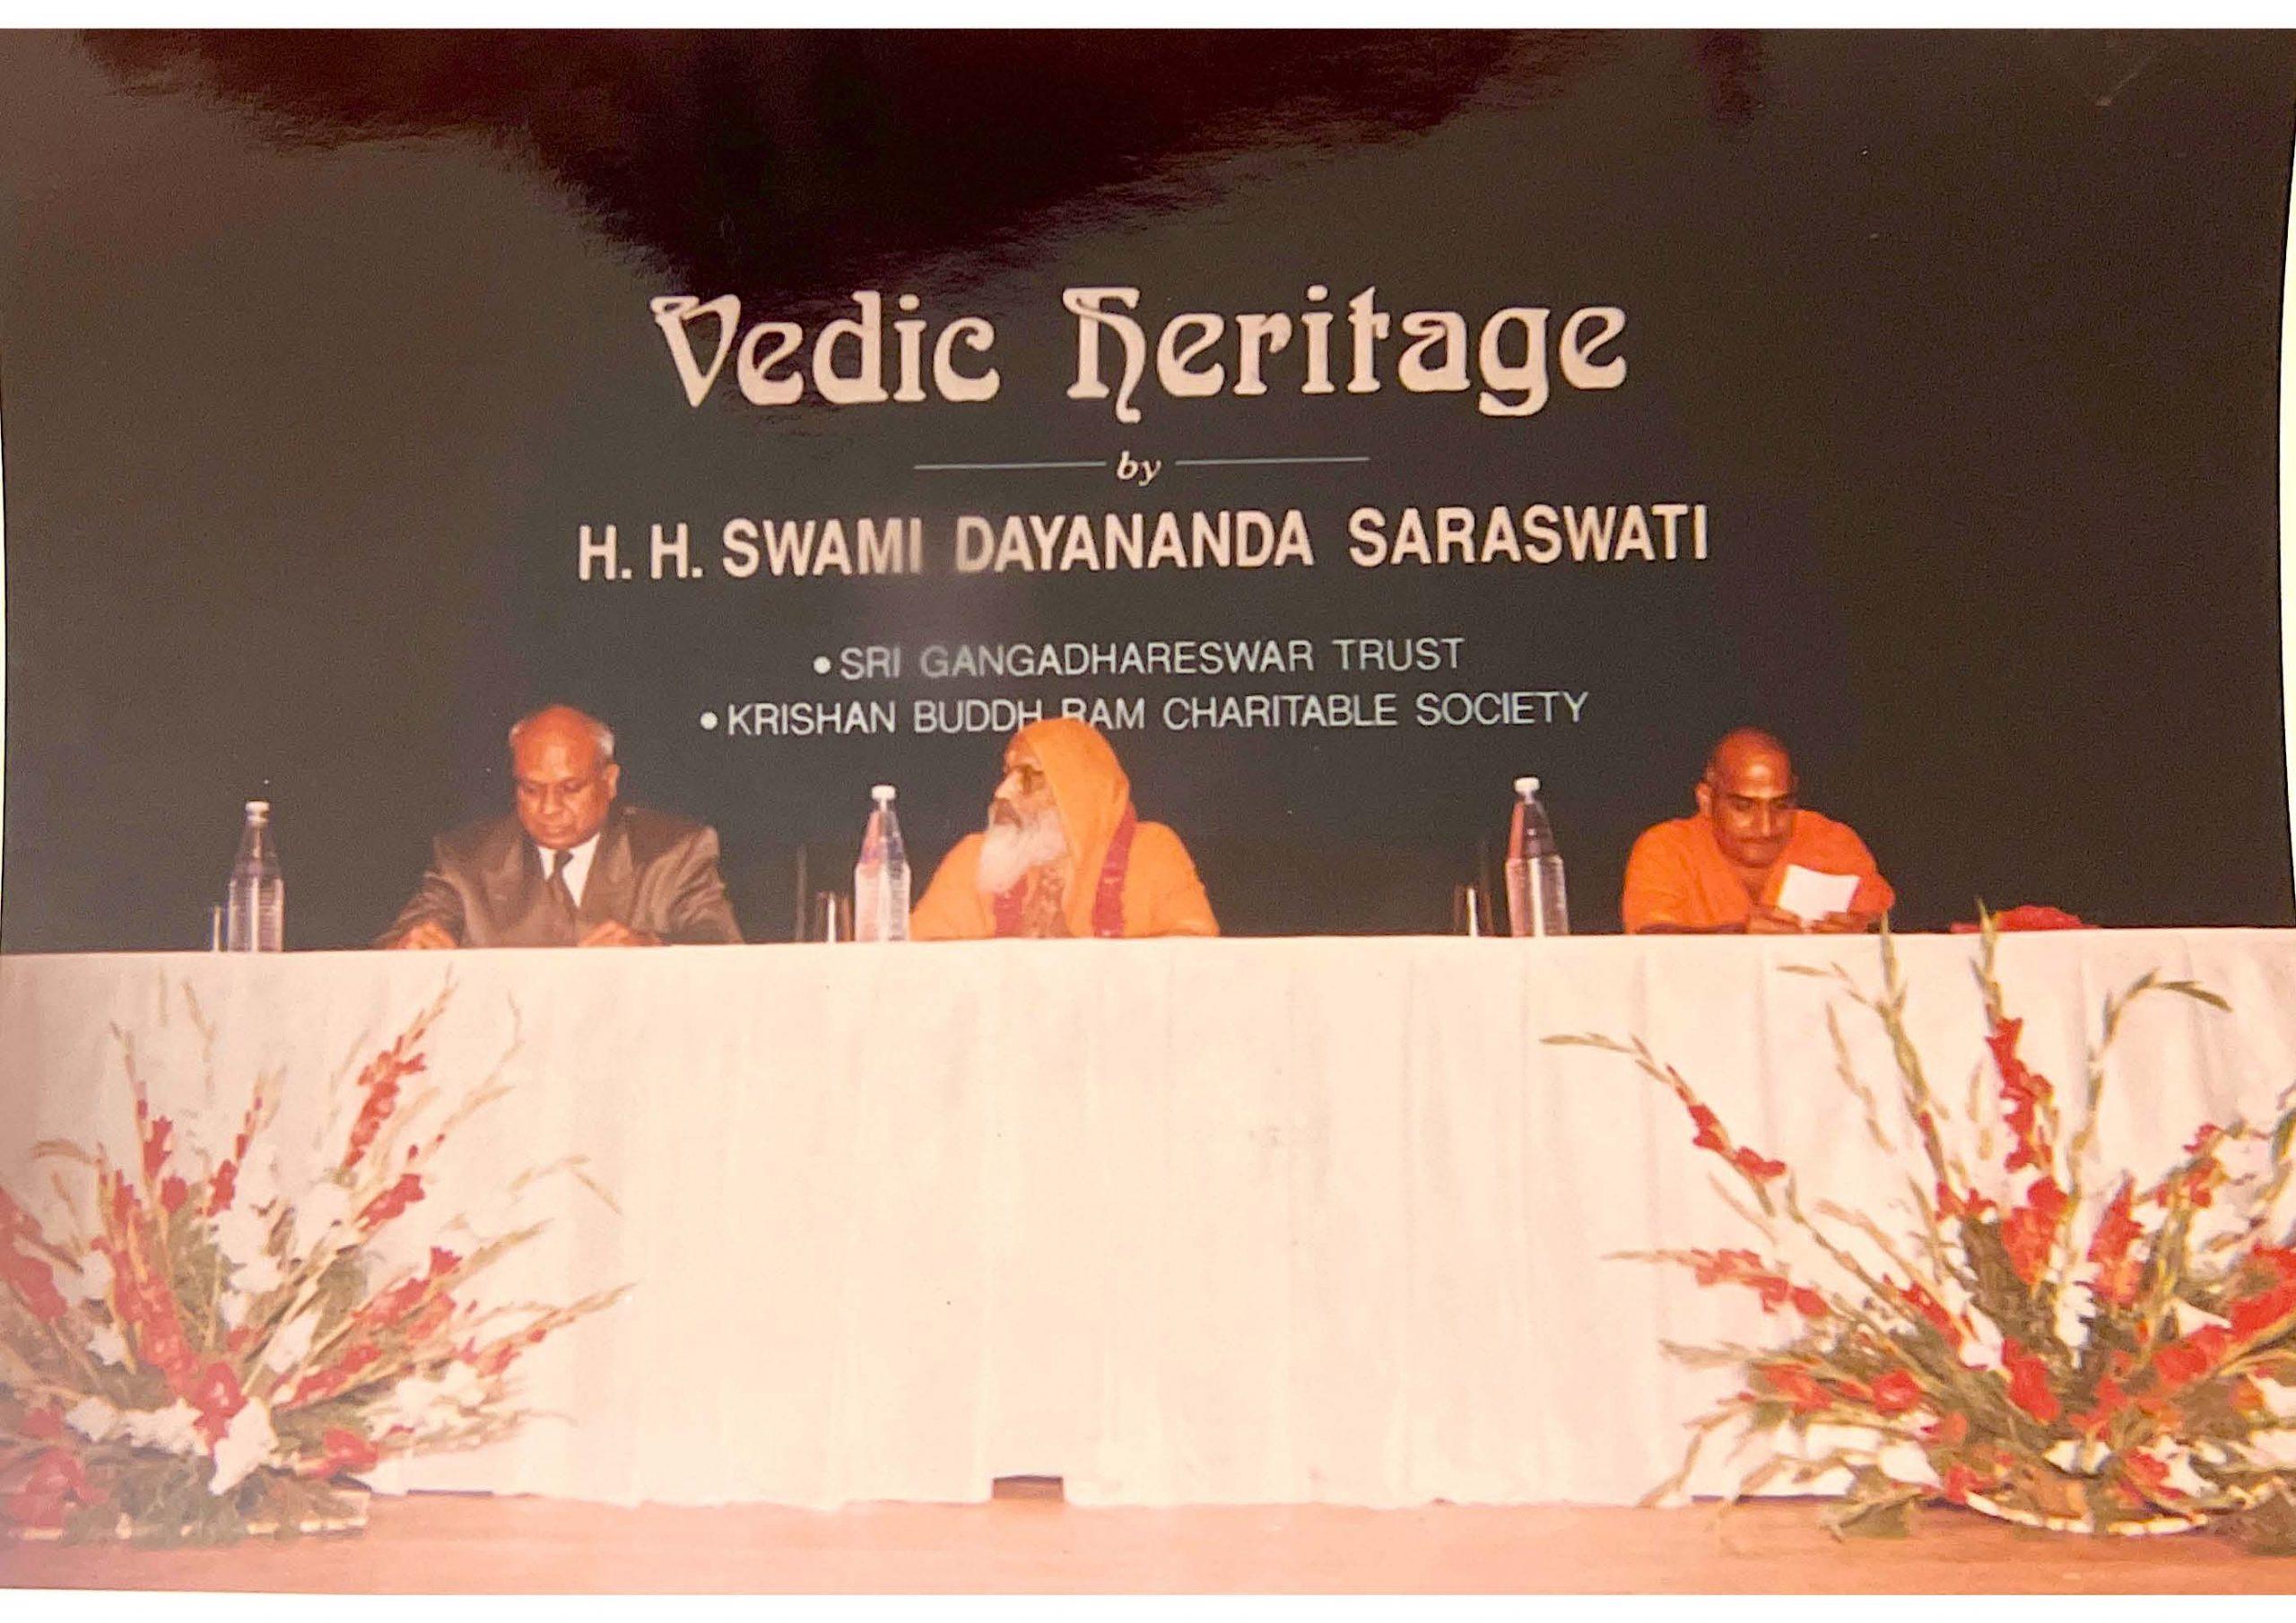 Dr. M with H.H Swami Dayananda Saraswati